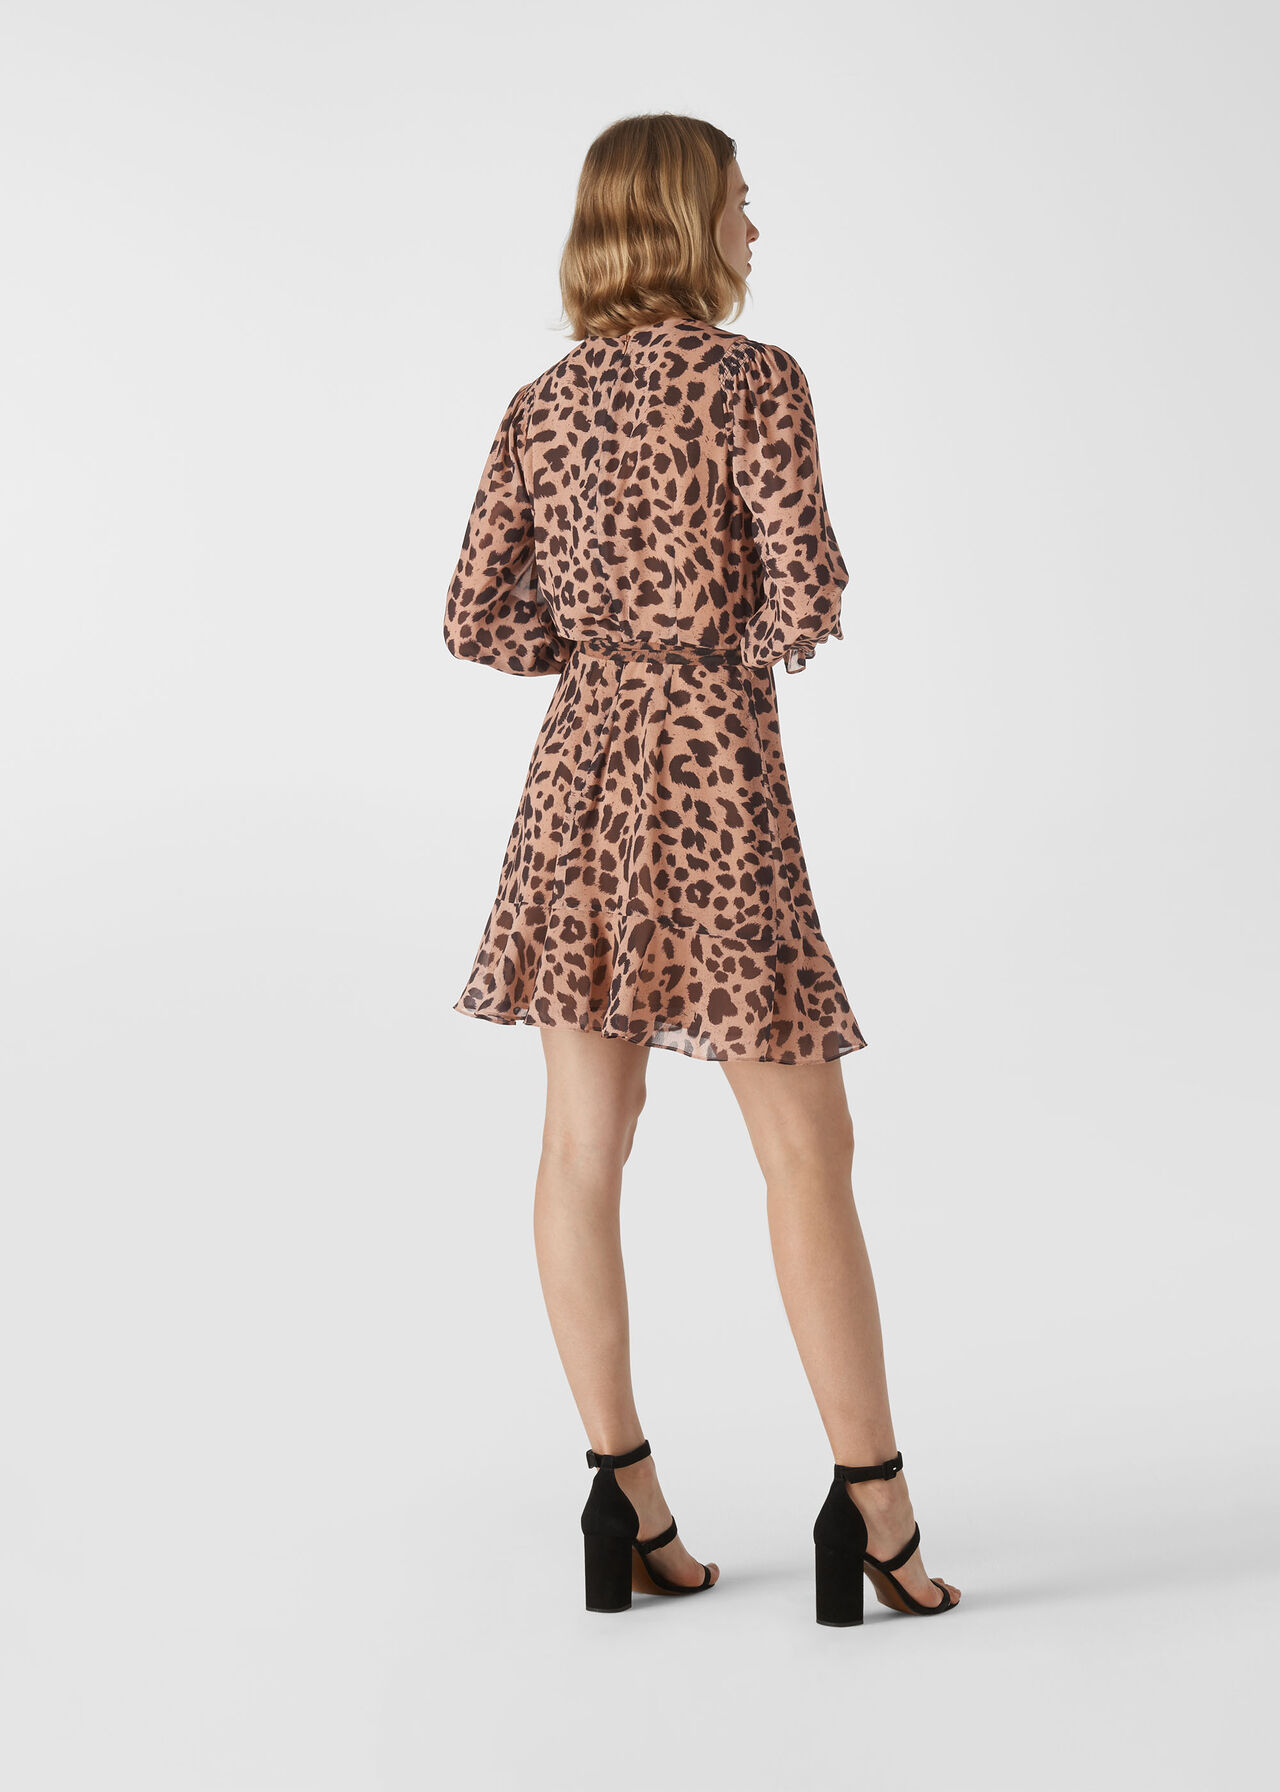 Brushed Cheetah Flippy Dress Leopard Print